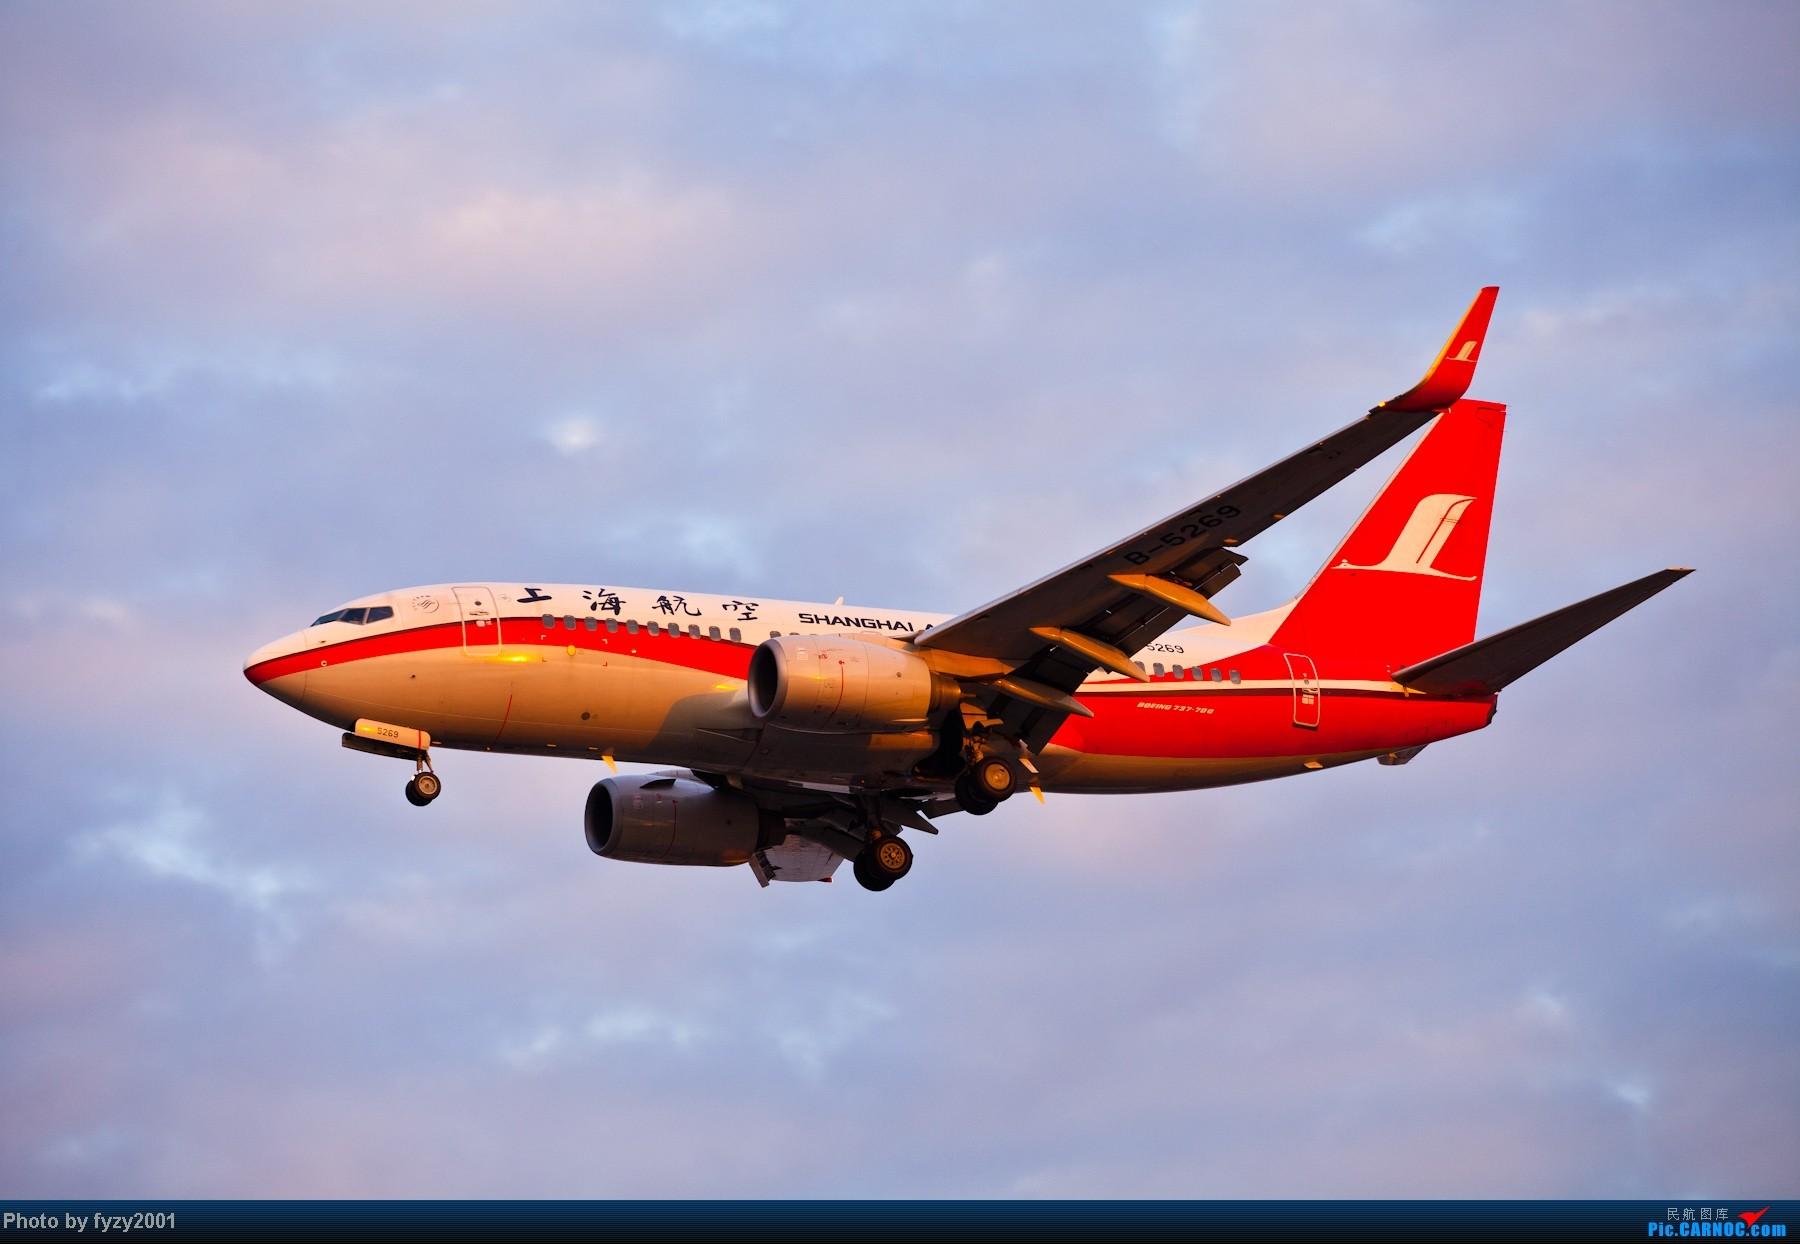 Re:[原创][无锡西站]追逐光影的脚步(1800大图) BOEING 737-700 B-5269 中国上海虹桥机场